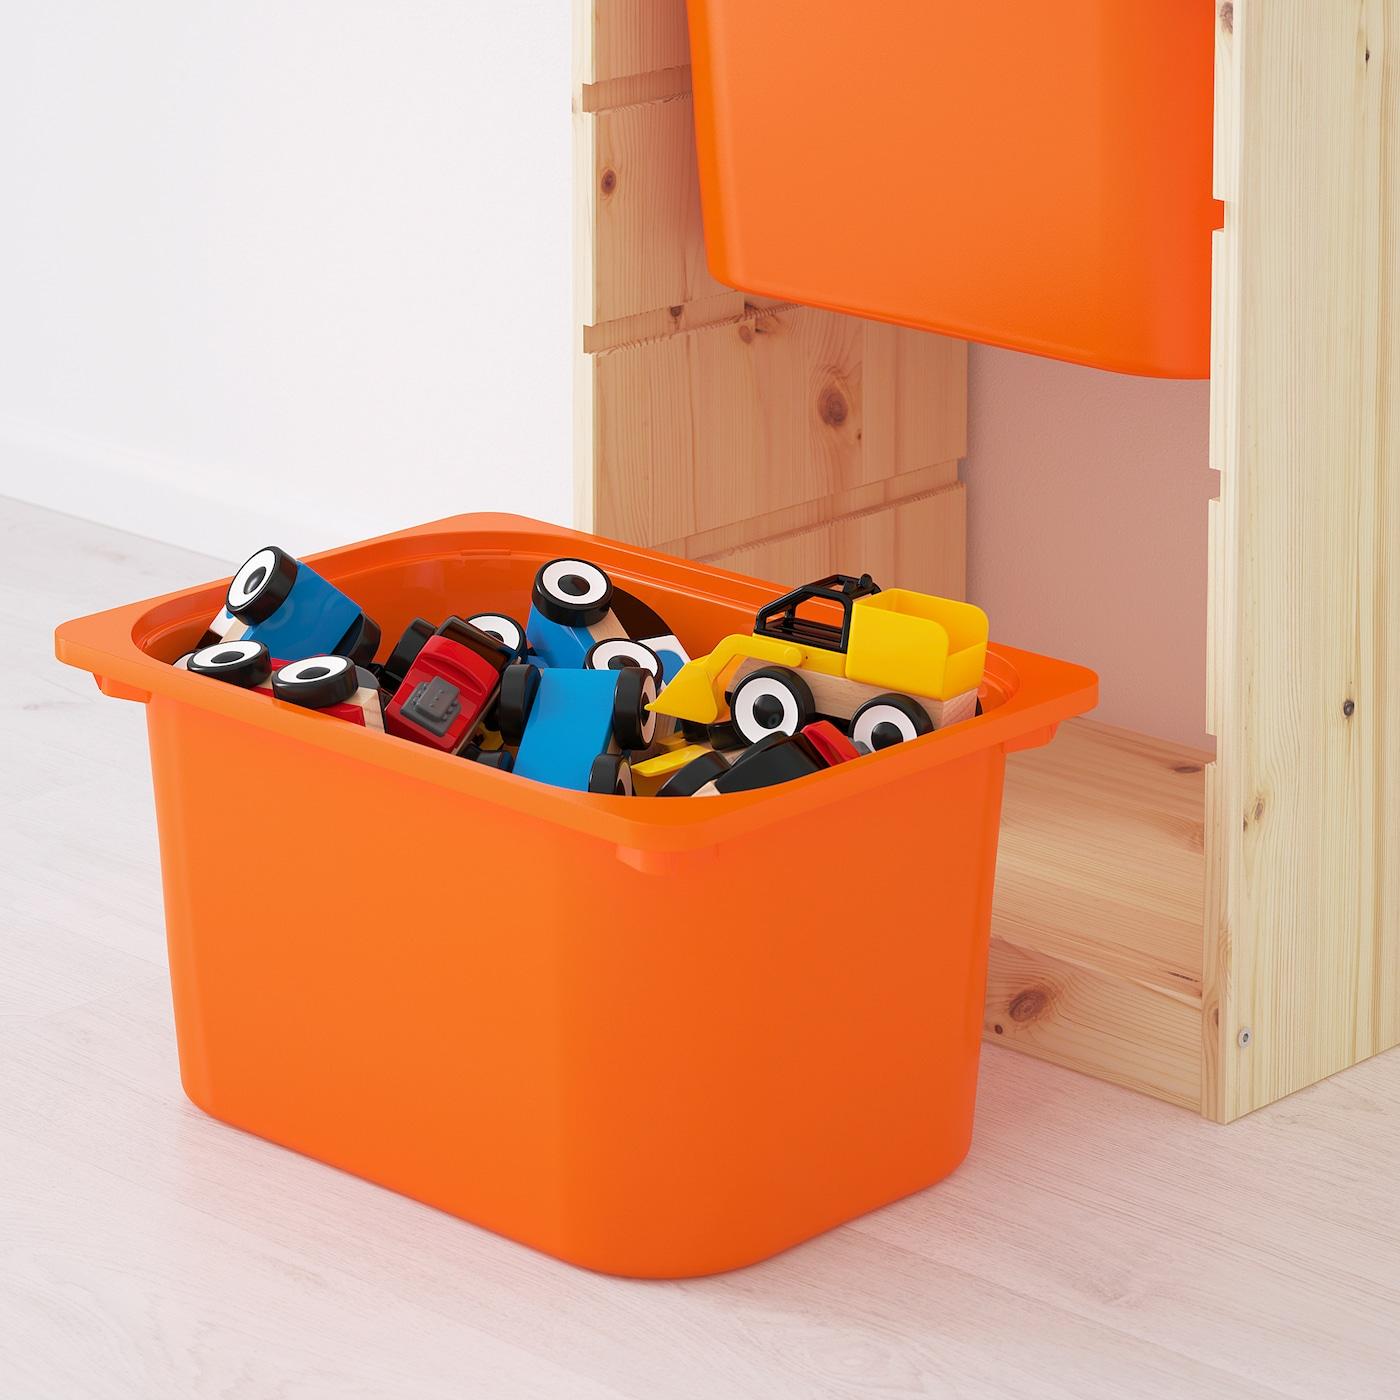 2x IKEA Orange TROFAST Storage Boxes To Fit TROFAST Units 42 x 30 x 23 cm lids